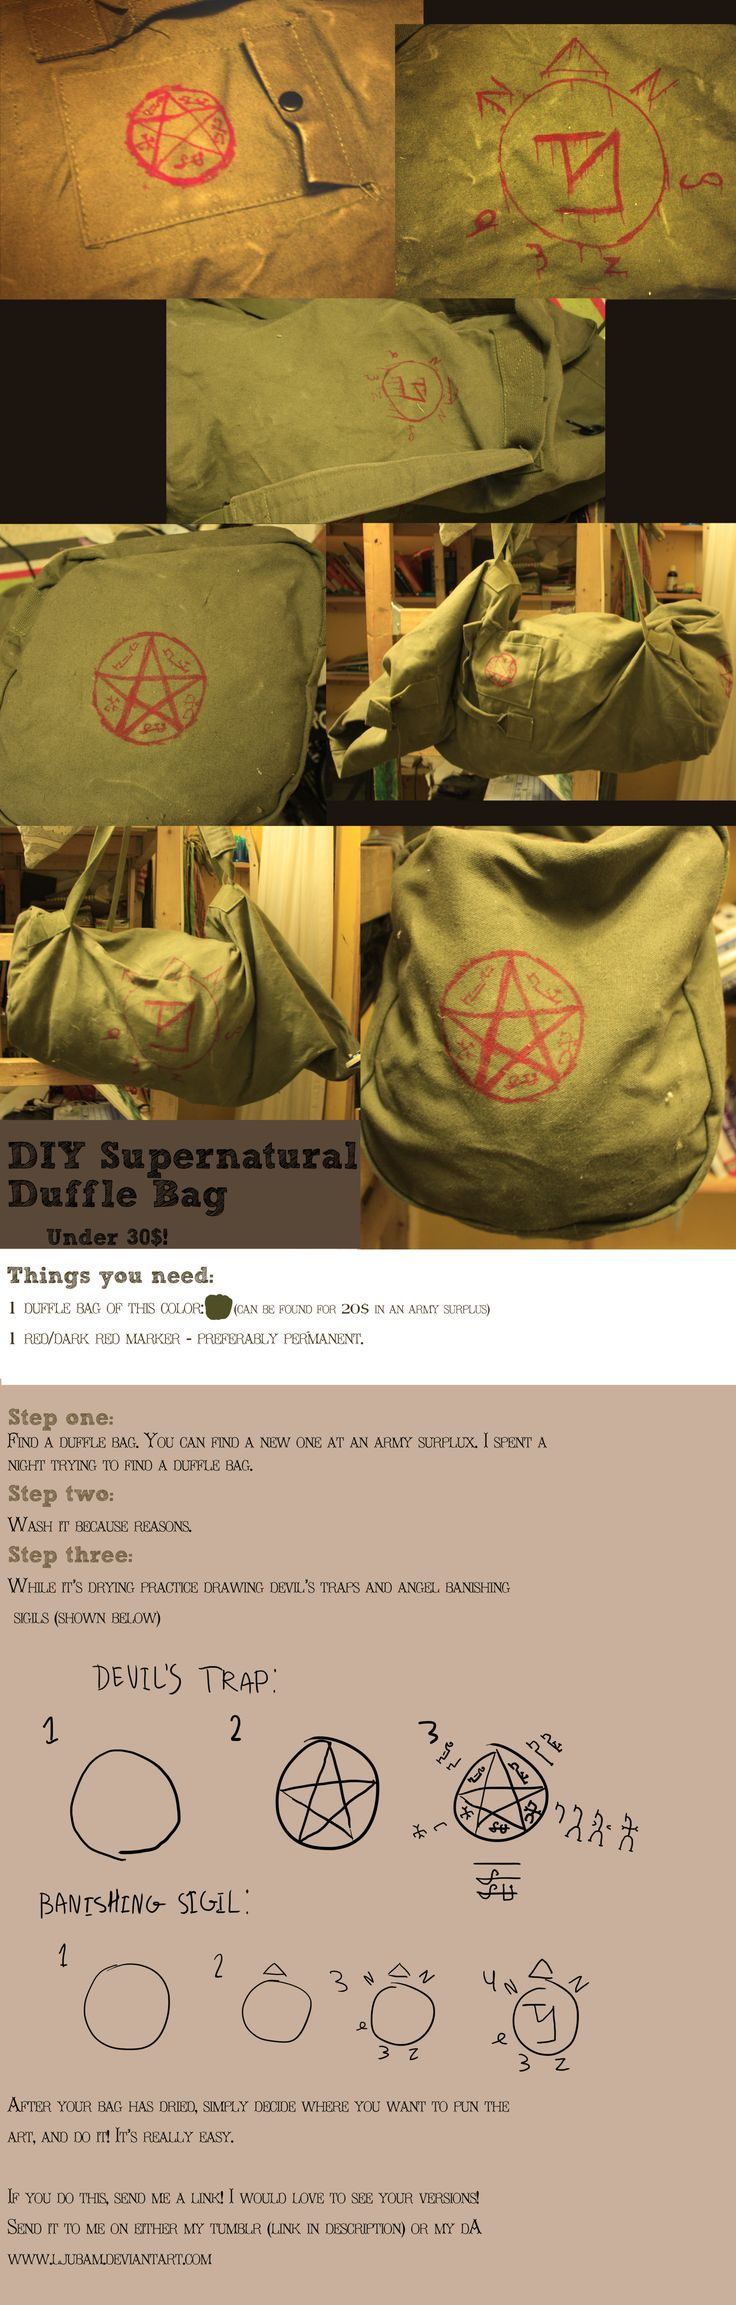 DIY Supernatural bag tutorial by LjubaM.deviantart.com on @deviantART